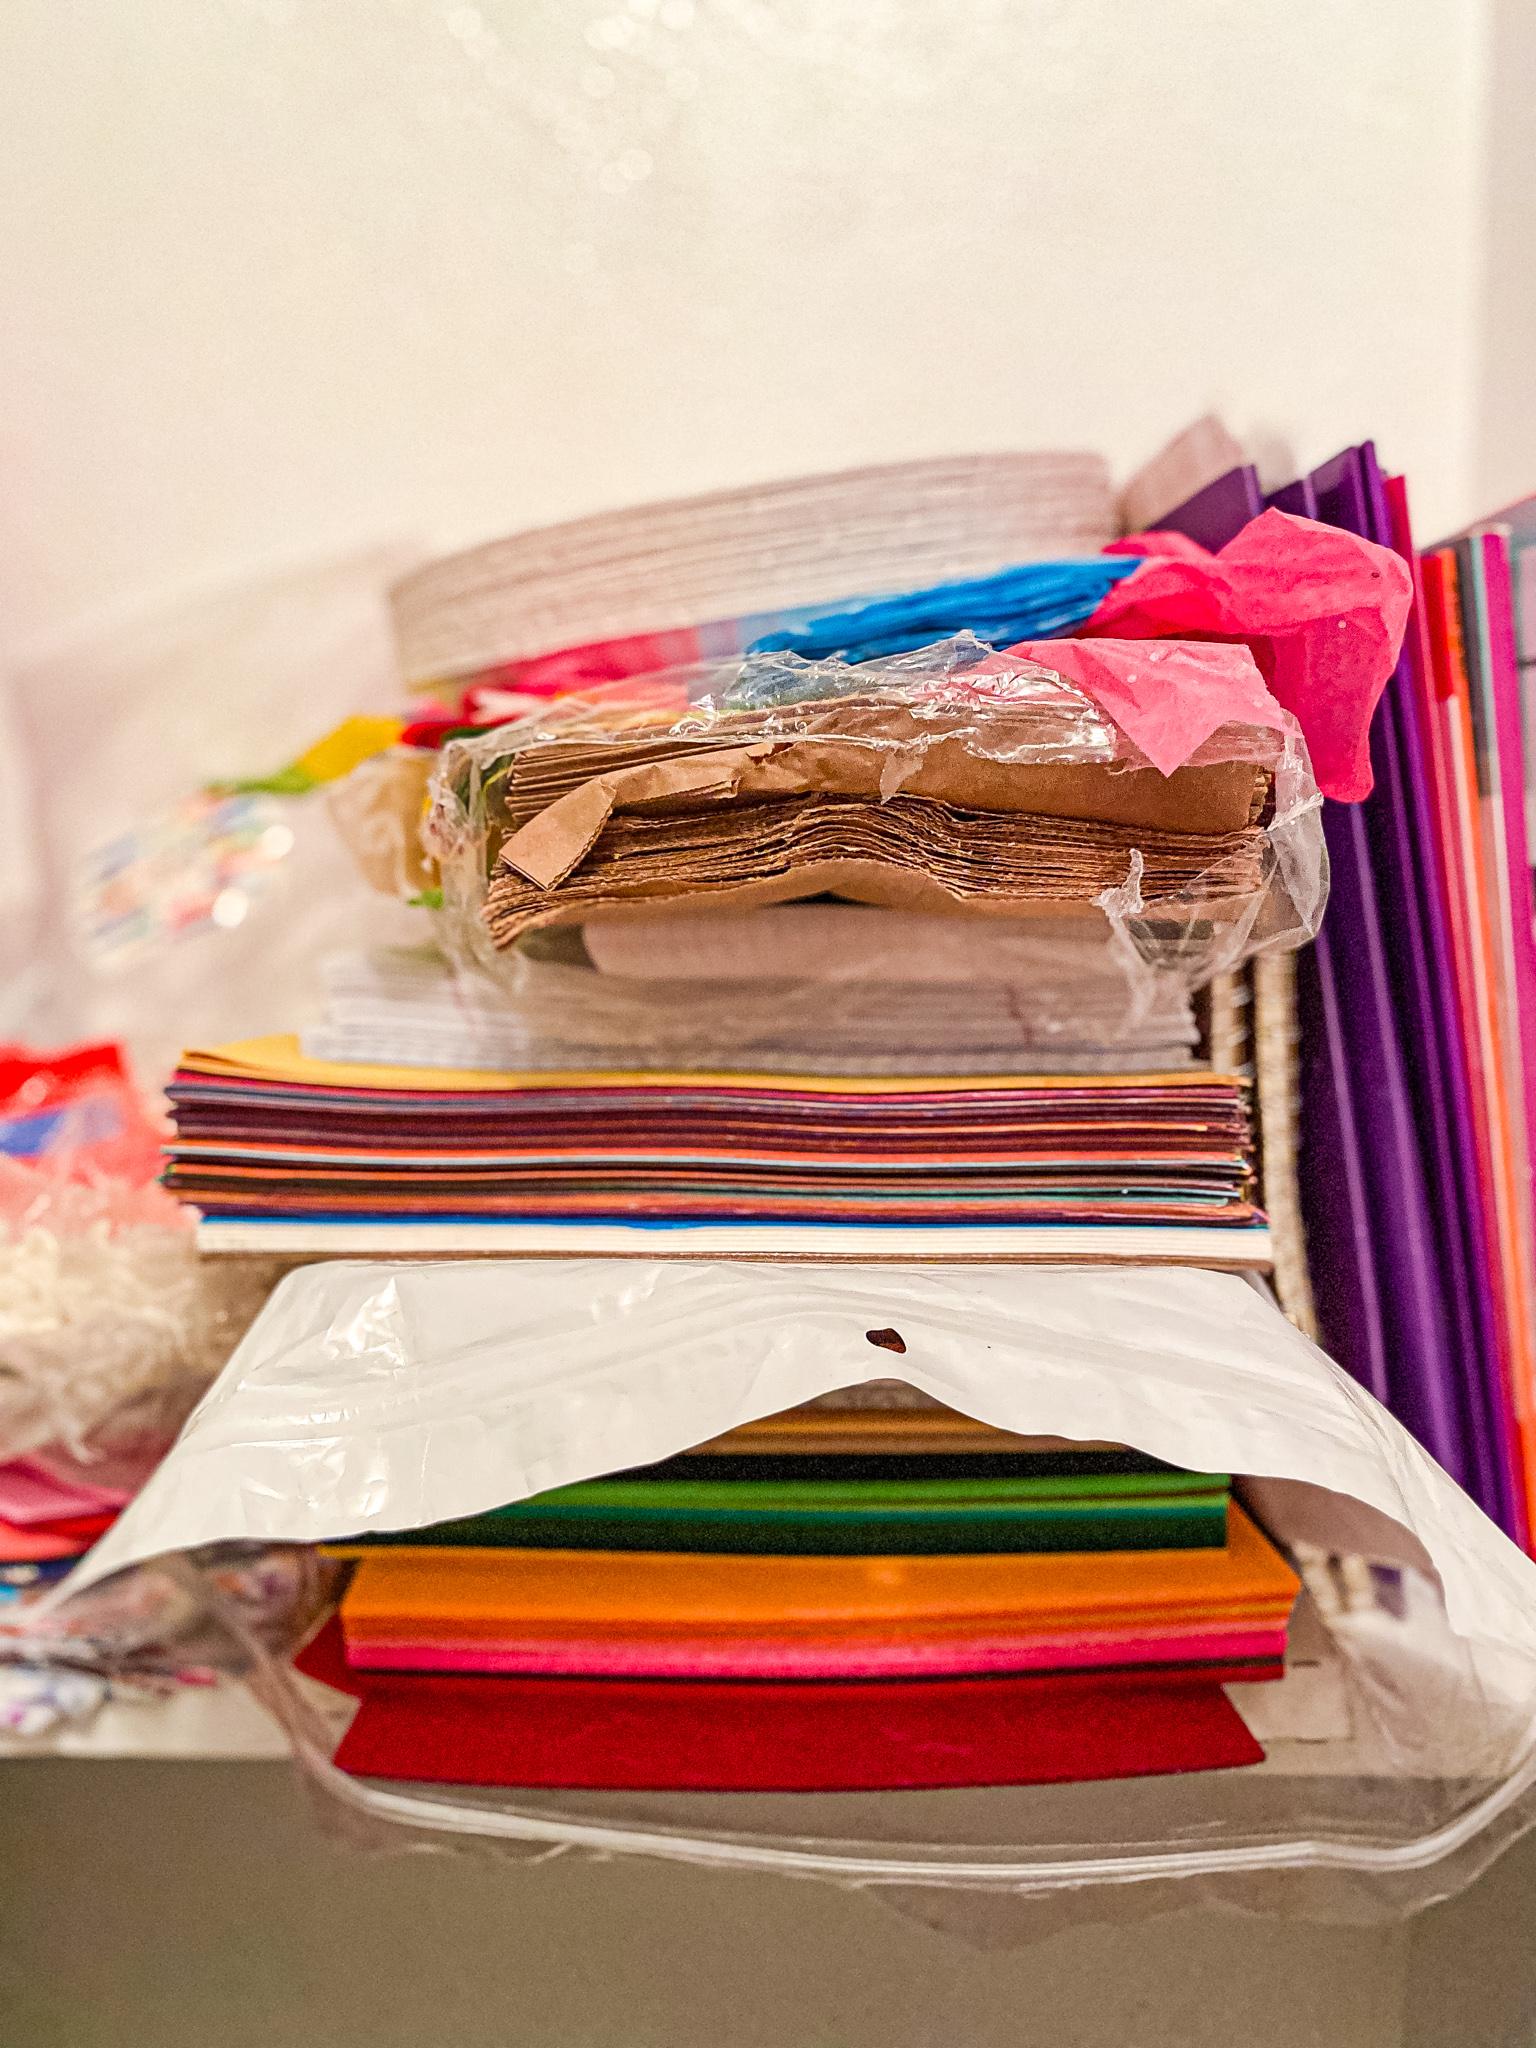 School Paper Stack - felt, construction paper, paper bags, tissue paper